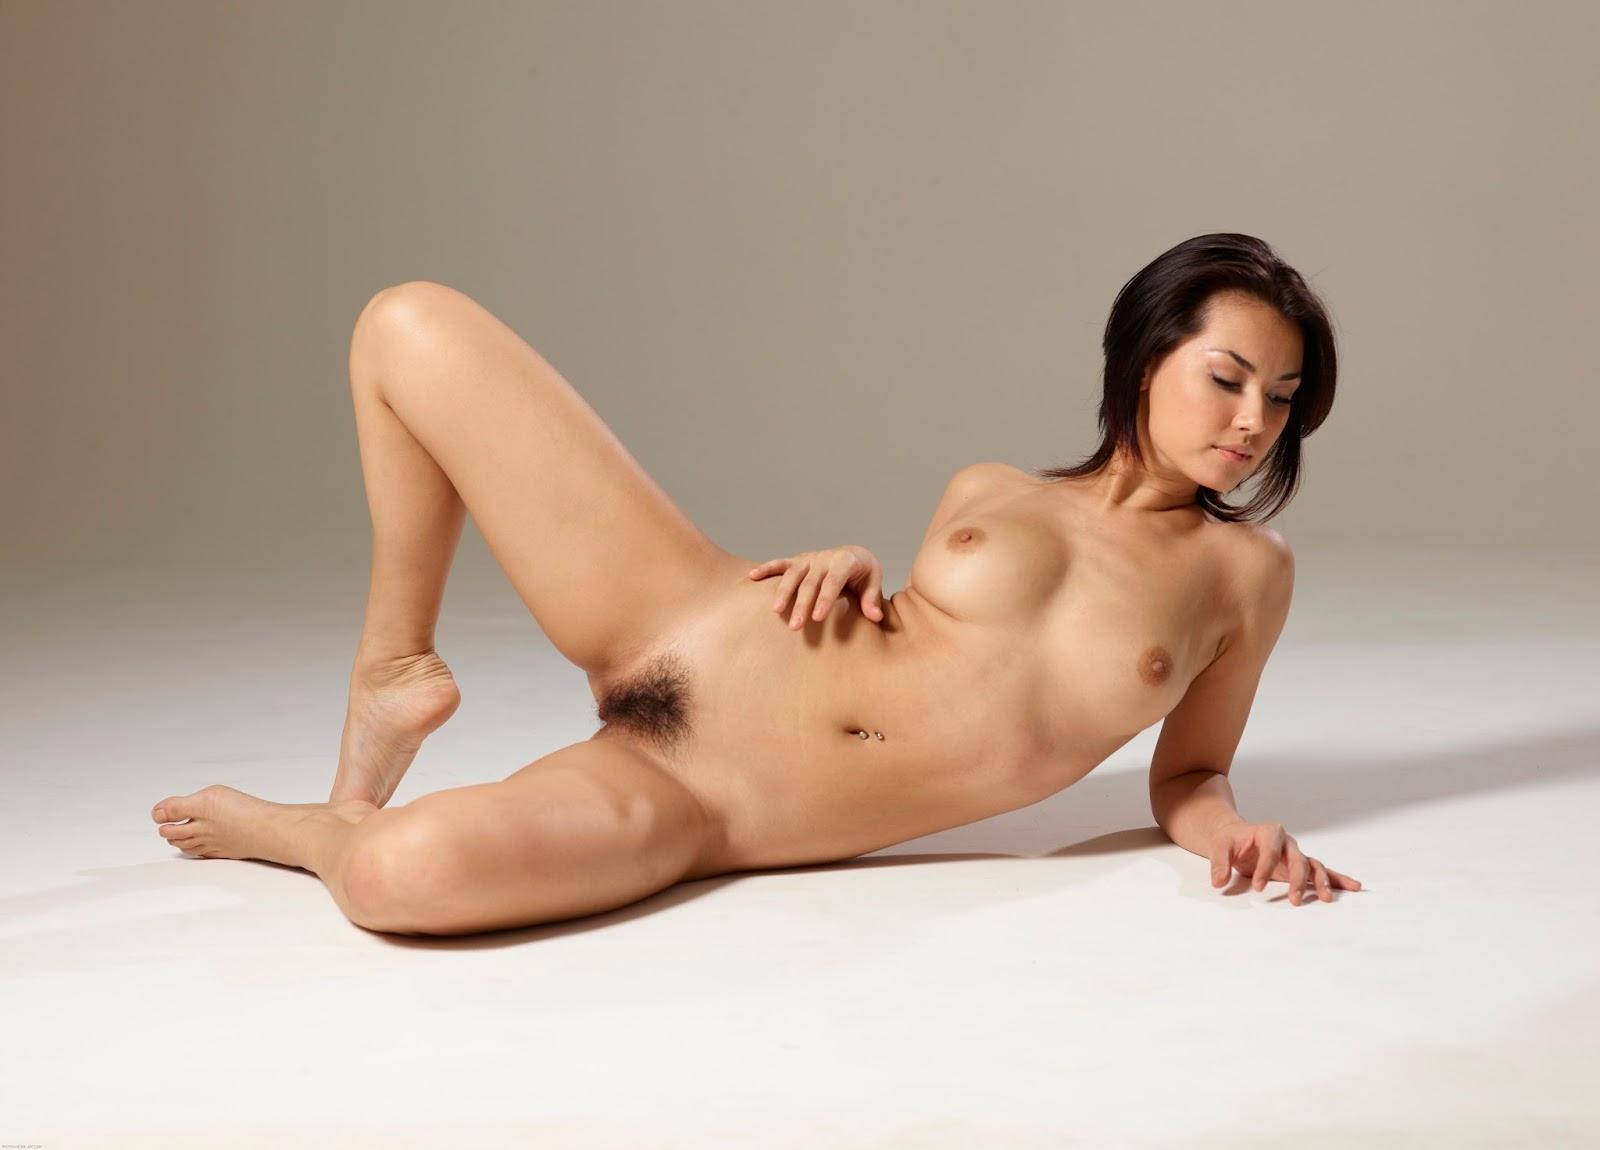 tits-video-japanese-beauties-maria-ozawa